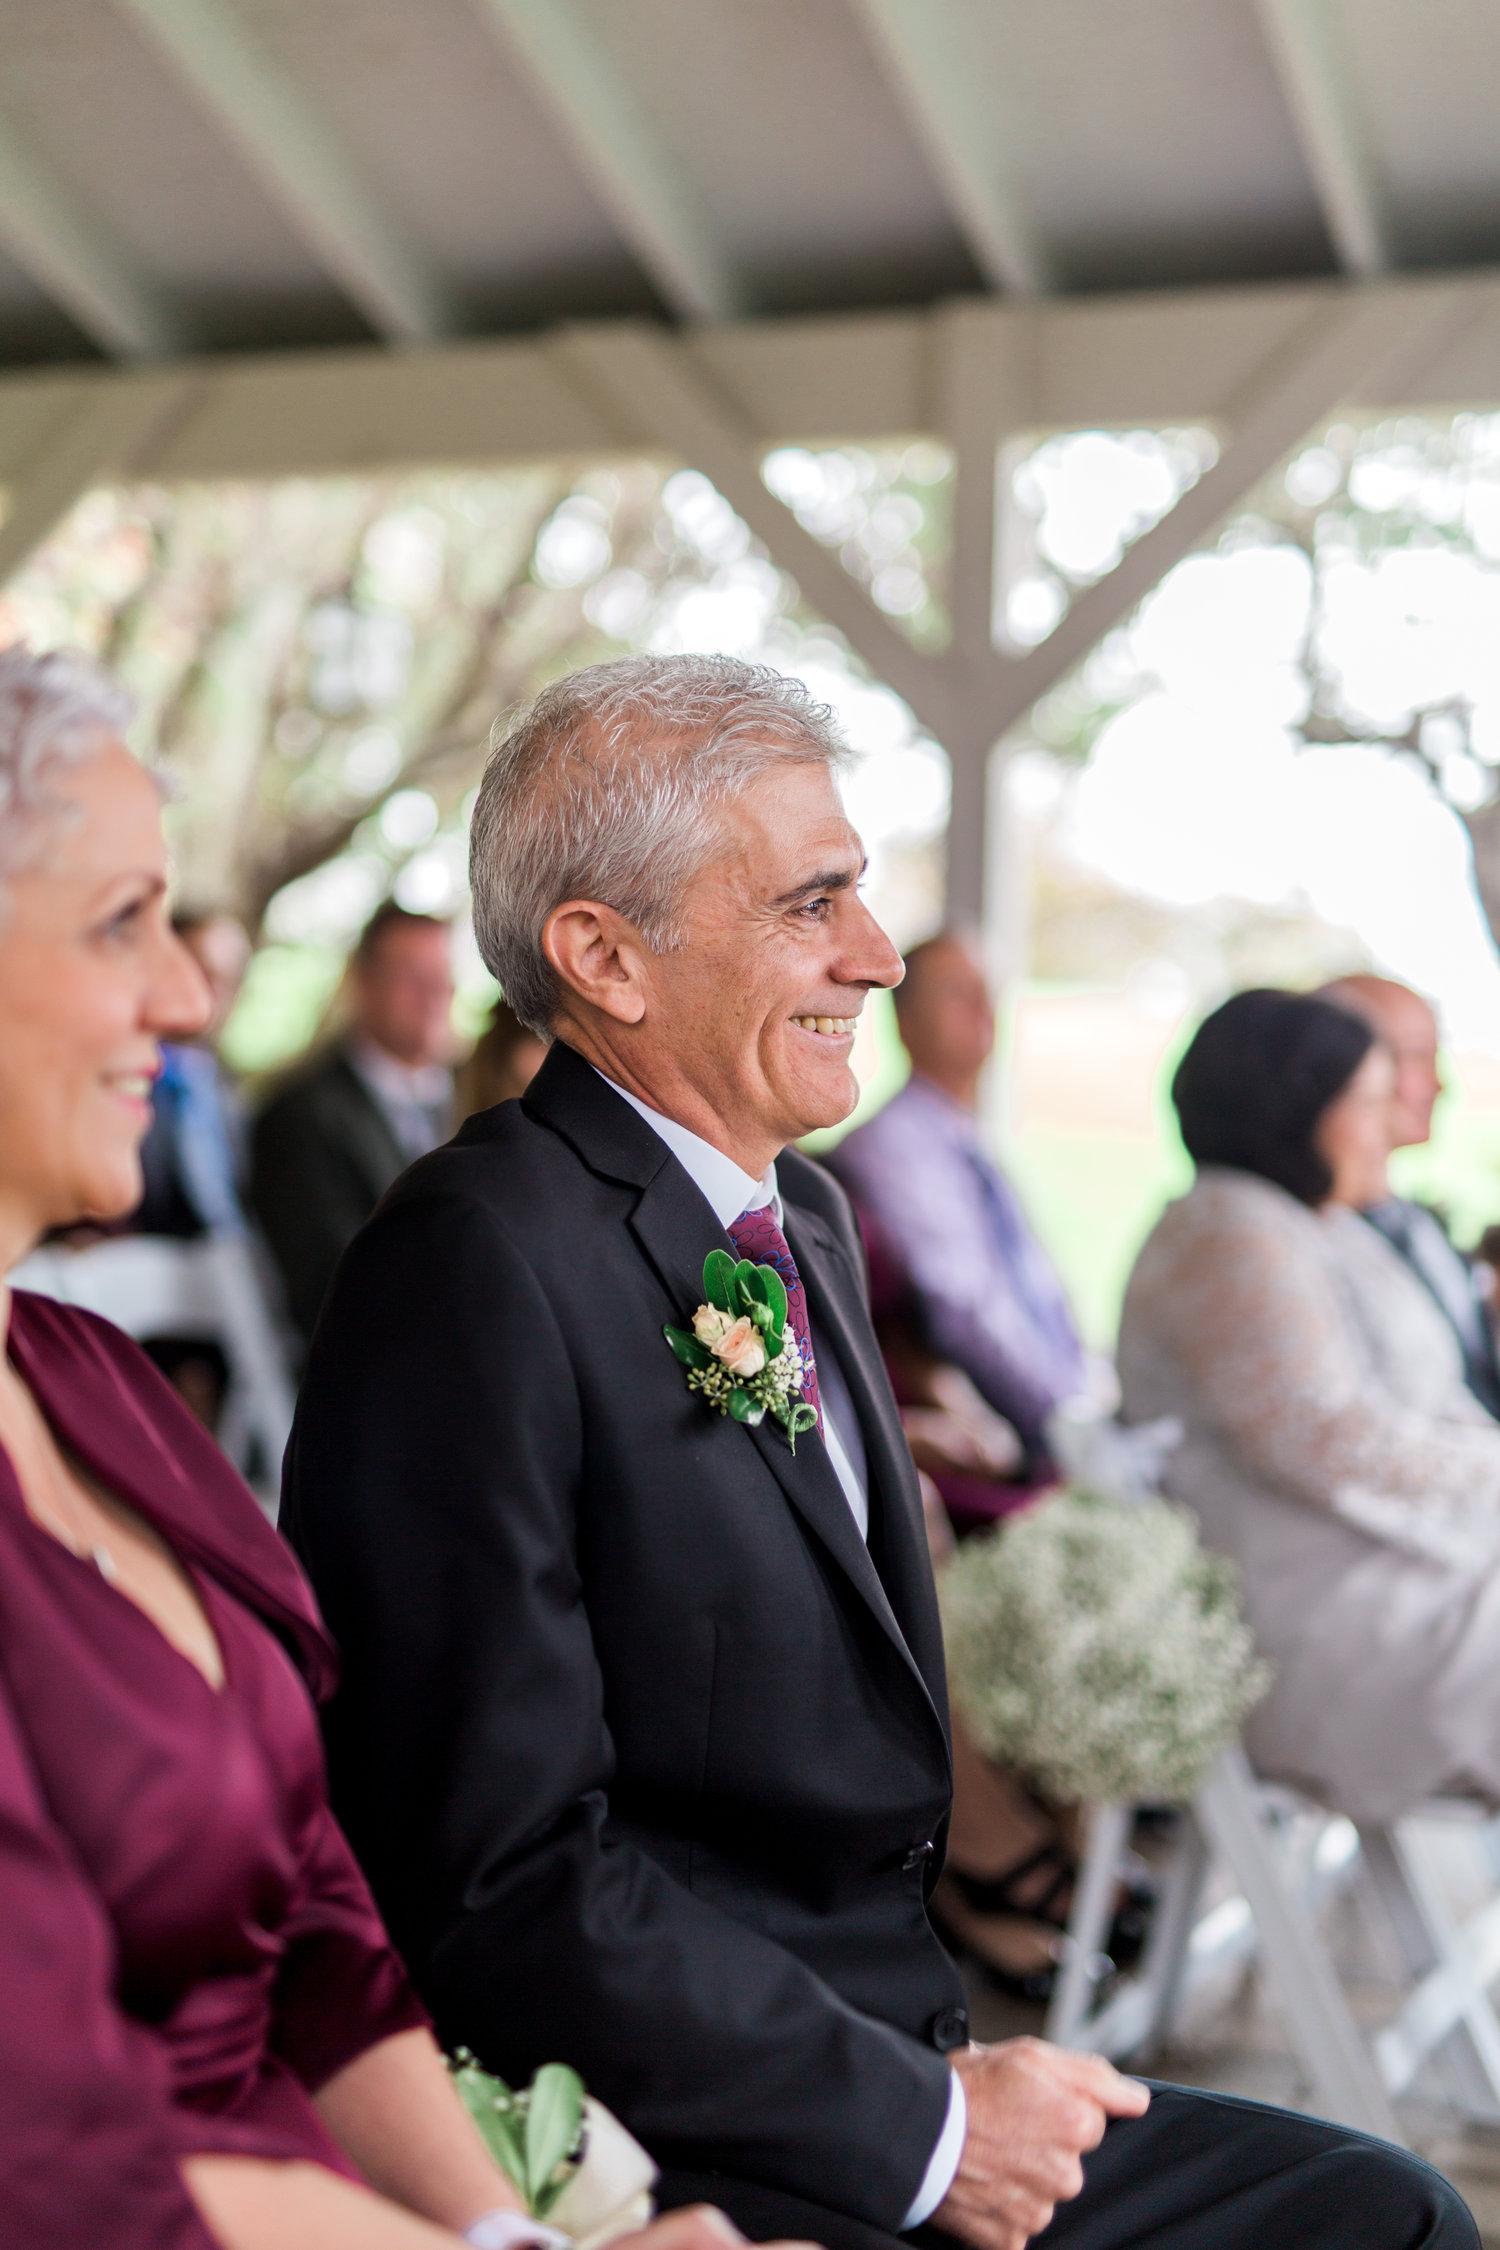 Amir-Golbazi-Danielle-Giroux-Photography_Toronto-Wedding_Cedarwood_Rachel-Paul_191.jpg